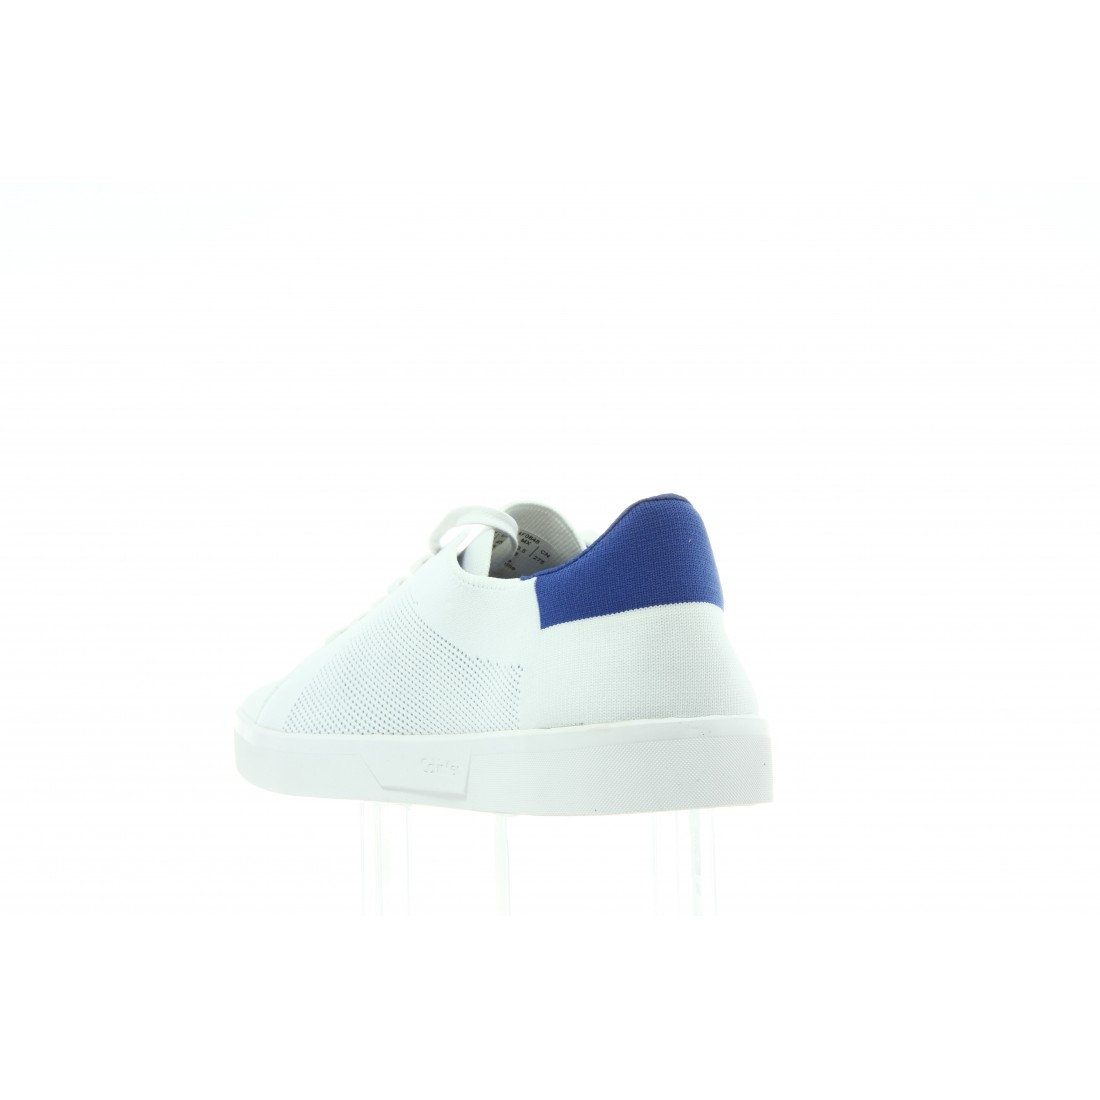 F0848 White Brave Blue Biały